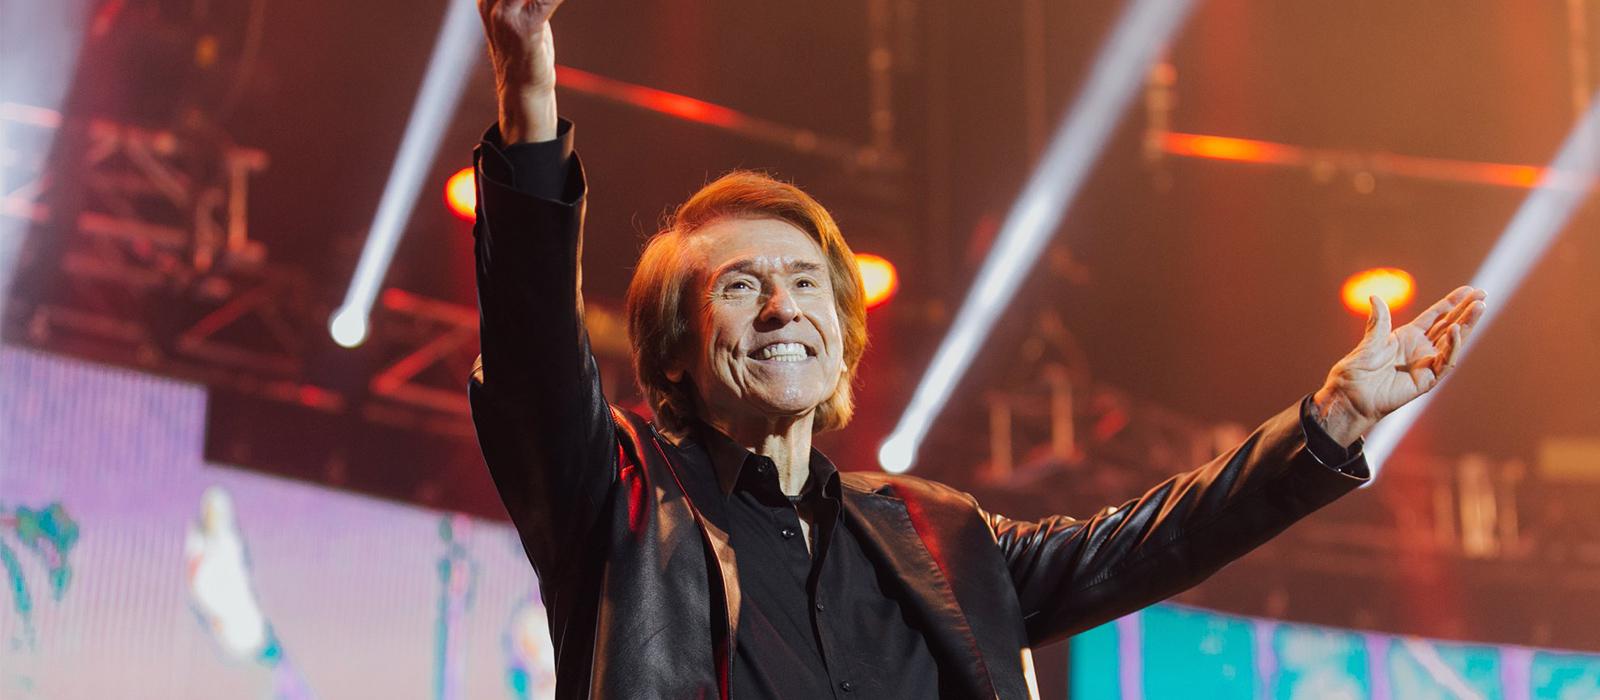 Raphael retoma la exitosa gira 'Loco Por Cantar' en España